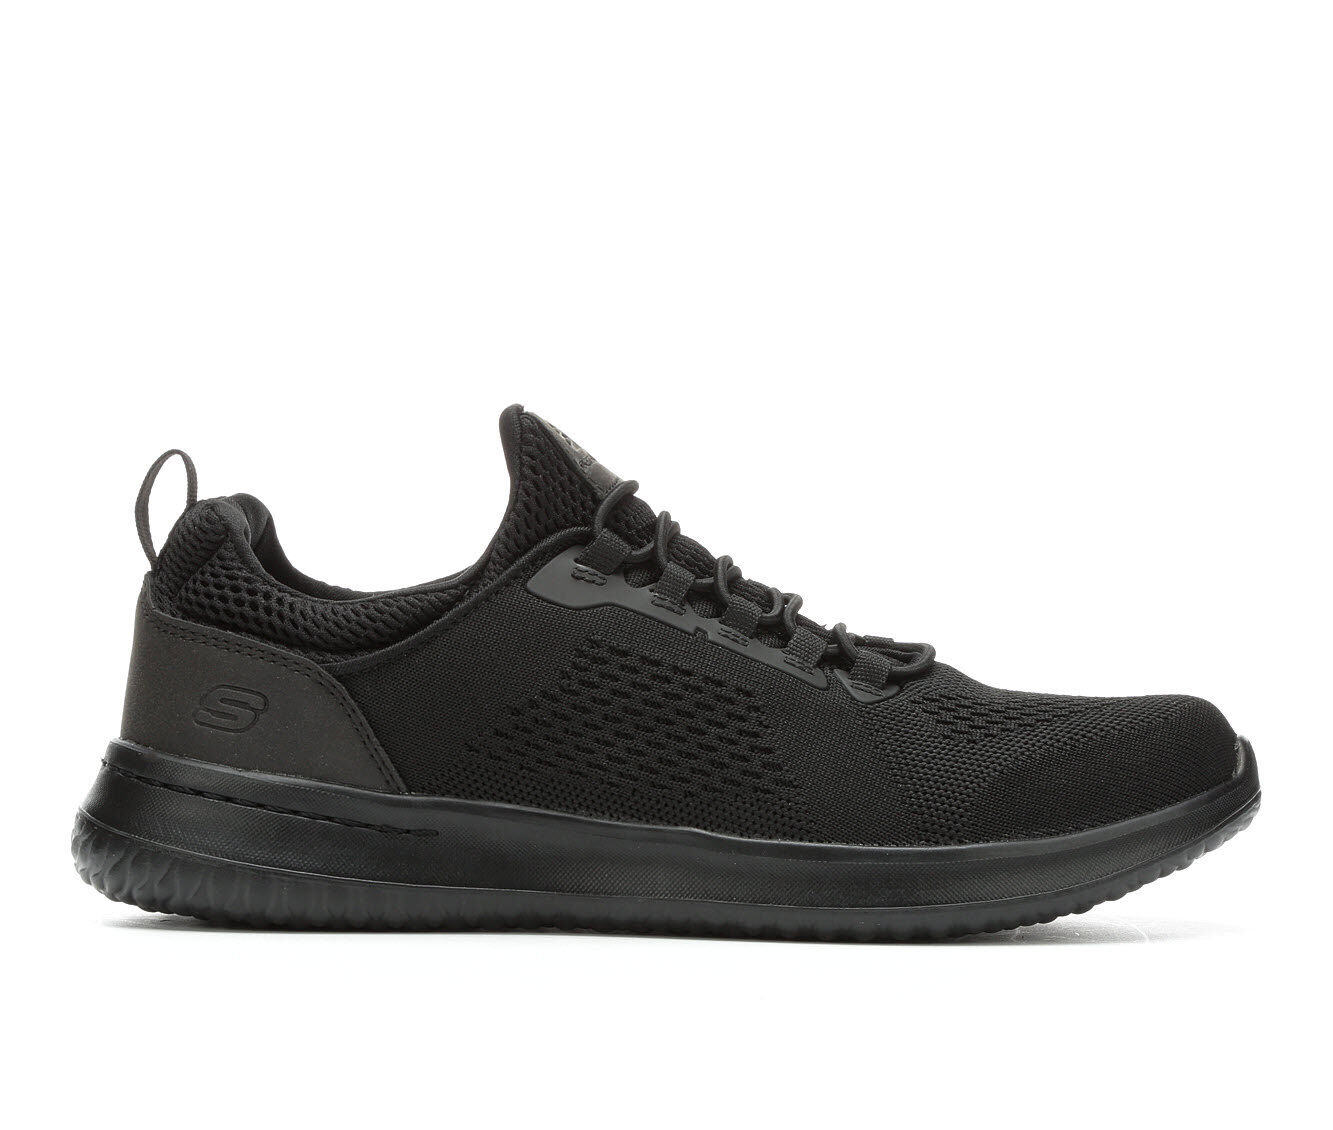 amazing price Men's Skechers Brewton 65509 Slip-On Sneakers buy cheap pay with visa deglX2Y